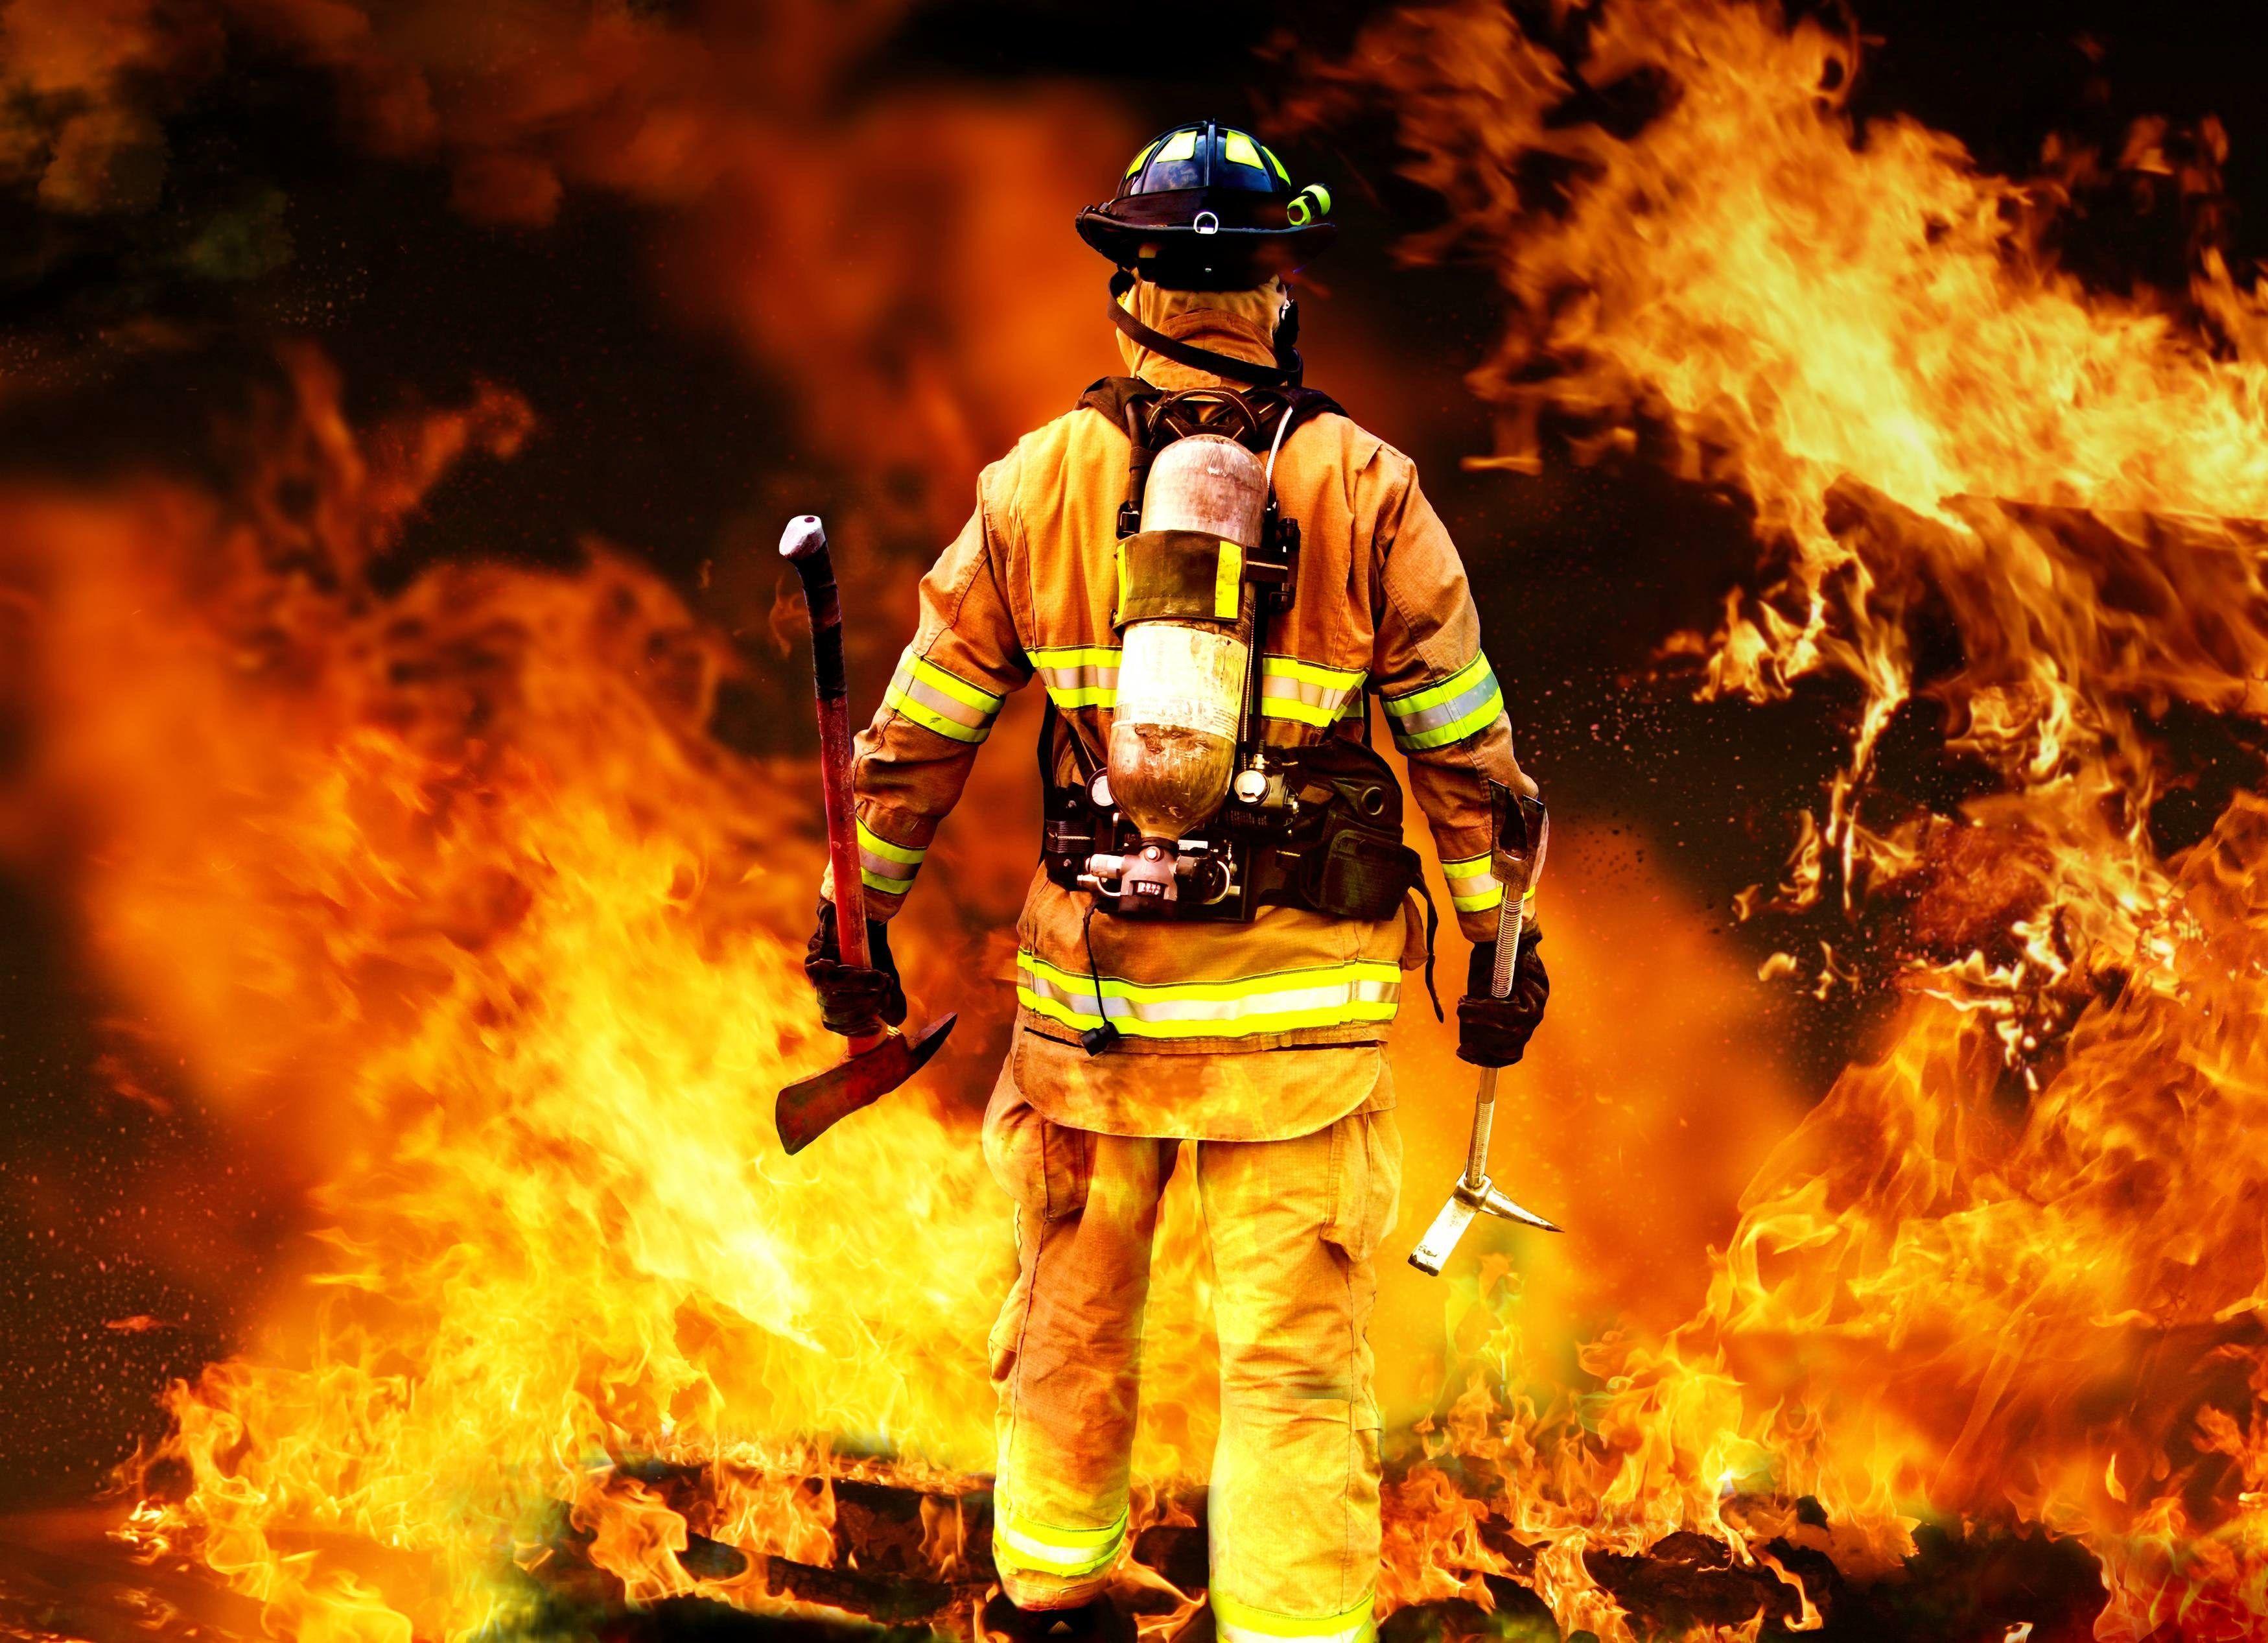 Fireman Wallpaper Treino Bombeiro Bombeiro Brigada De Incendio